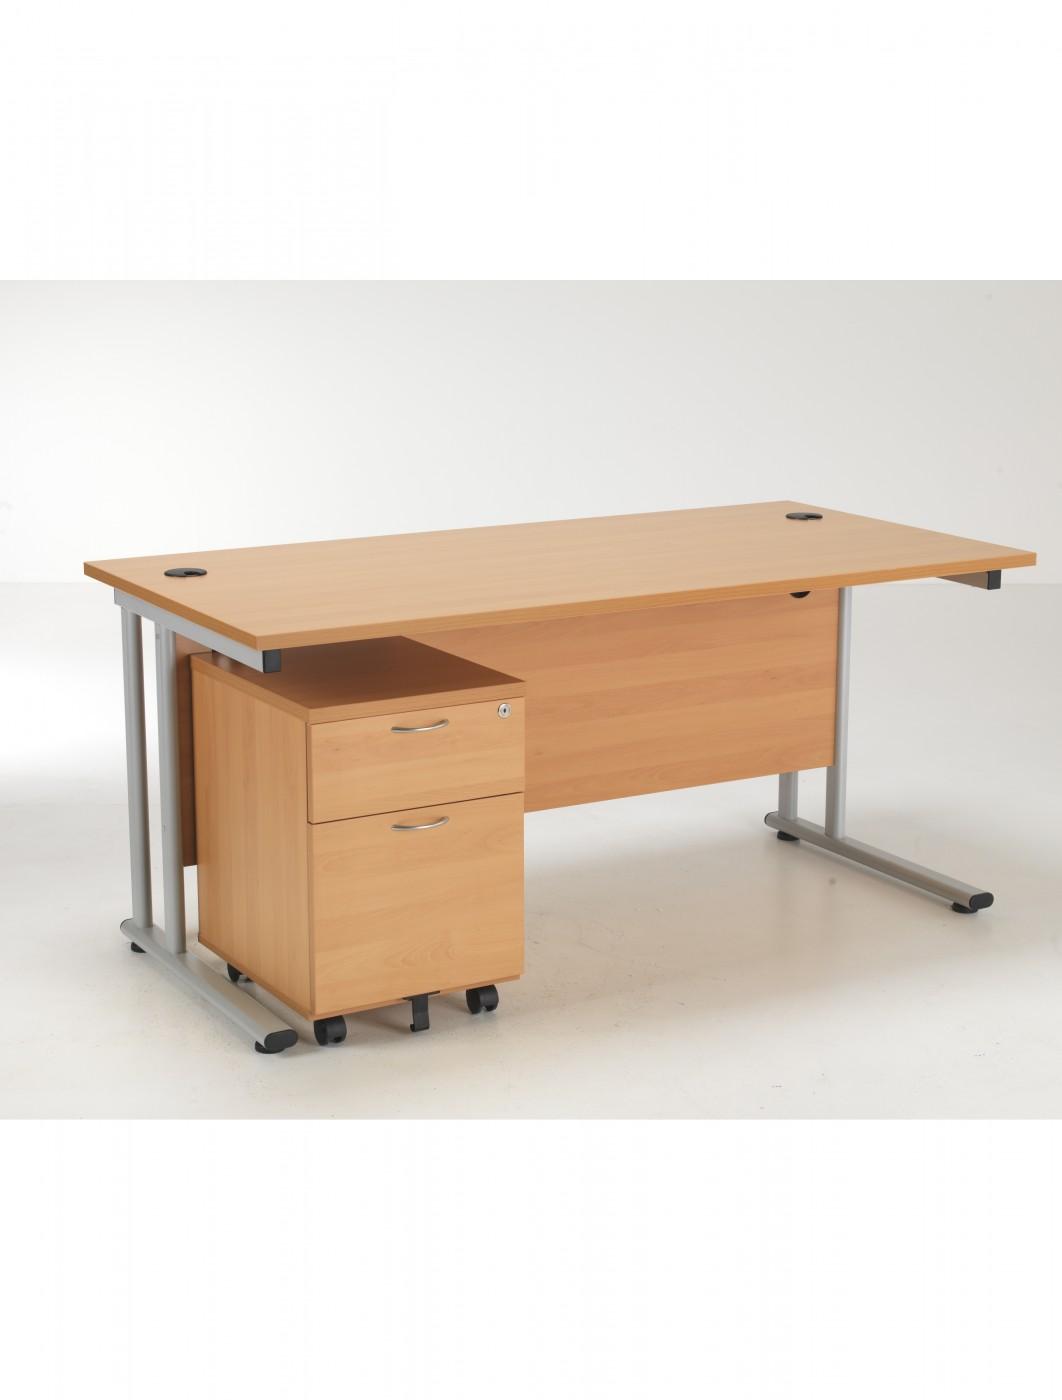 Tc Desk And Pedestal Lite Bund2be